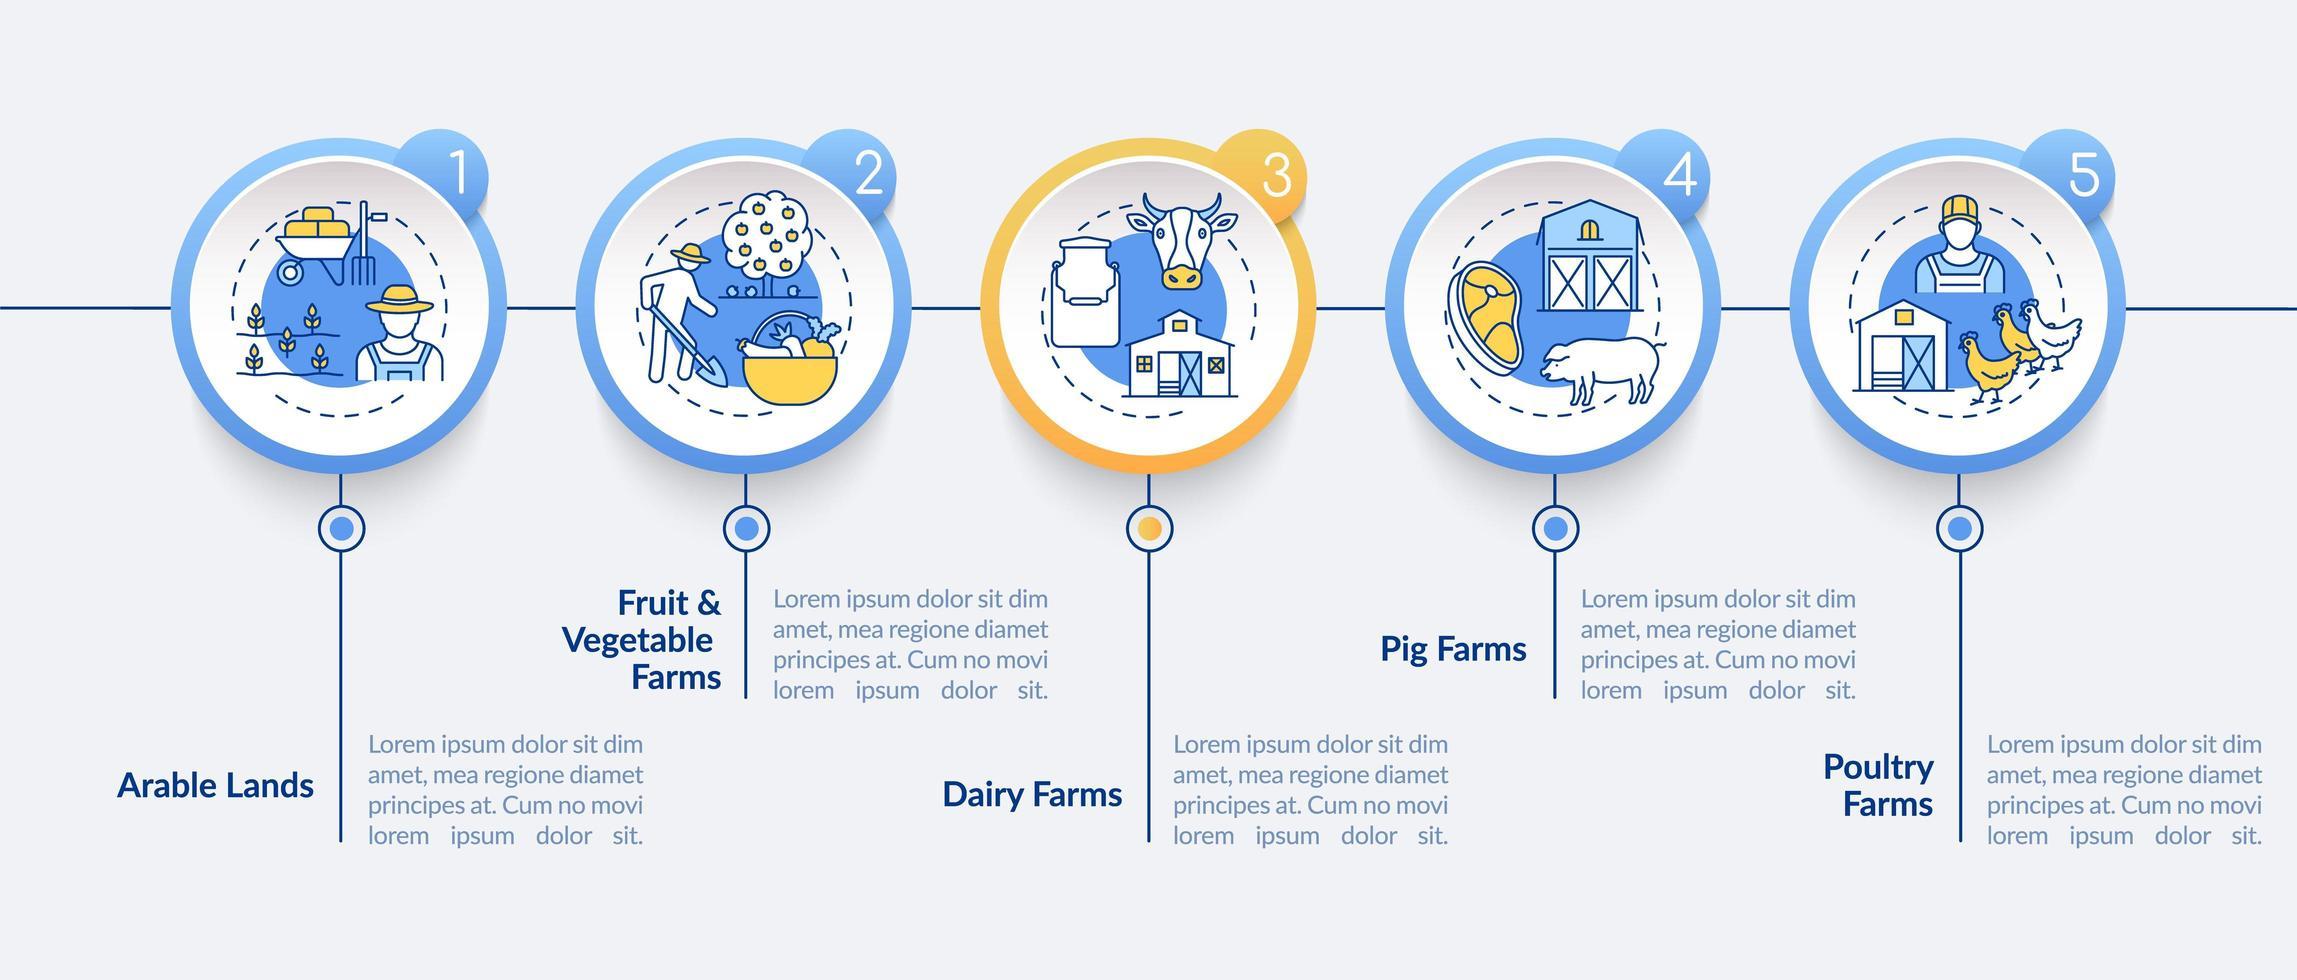 tipos de producción agrícola plantilla de infografía vectorial vector